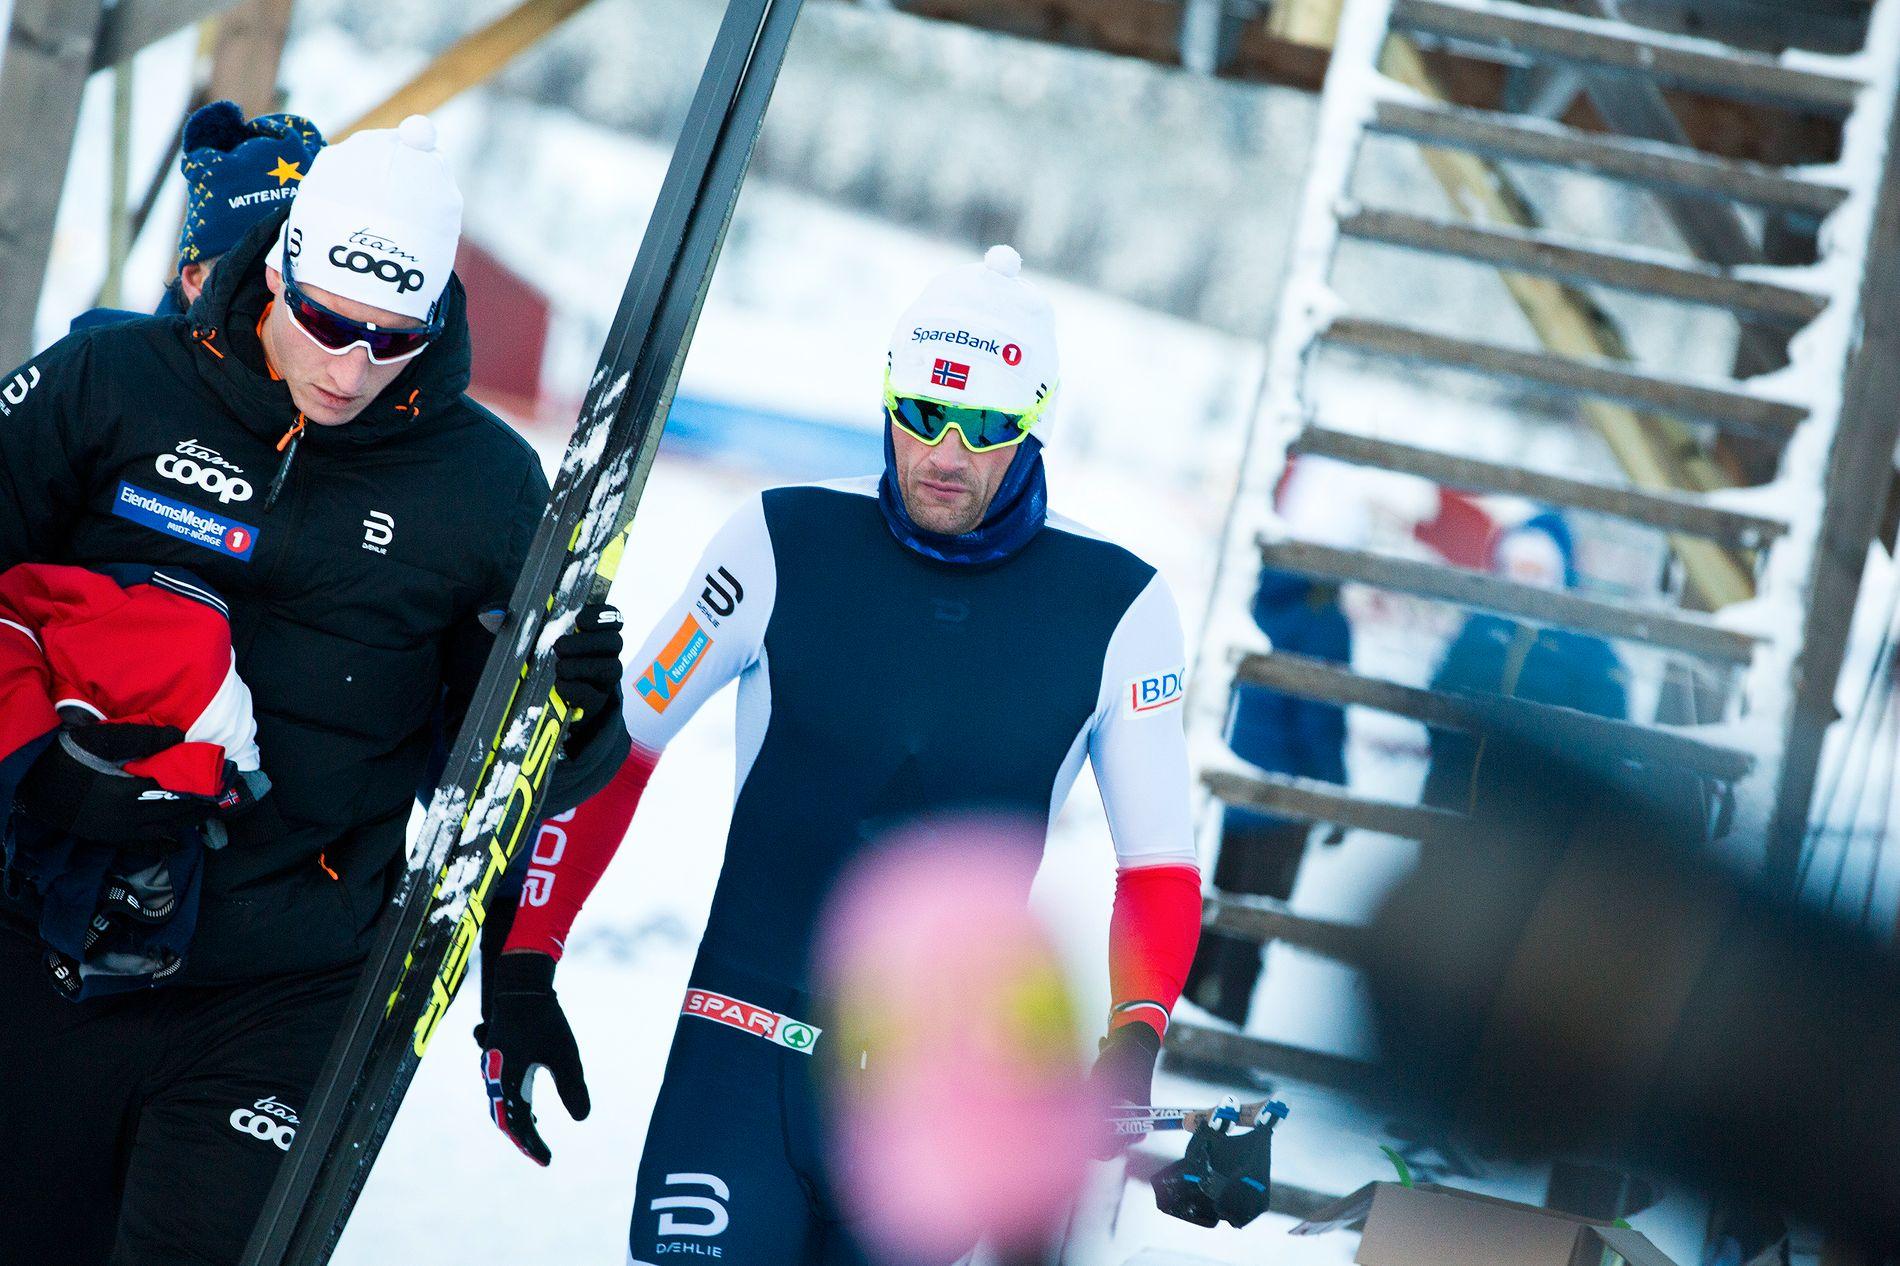 LETER ETTER FORMEN: Petter Northug, her sammen med servicemann i Team Northug Vidar Undebakke, etter rennet i Piteå, Sverige søndag.